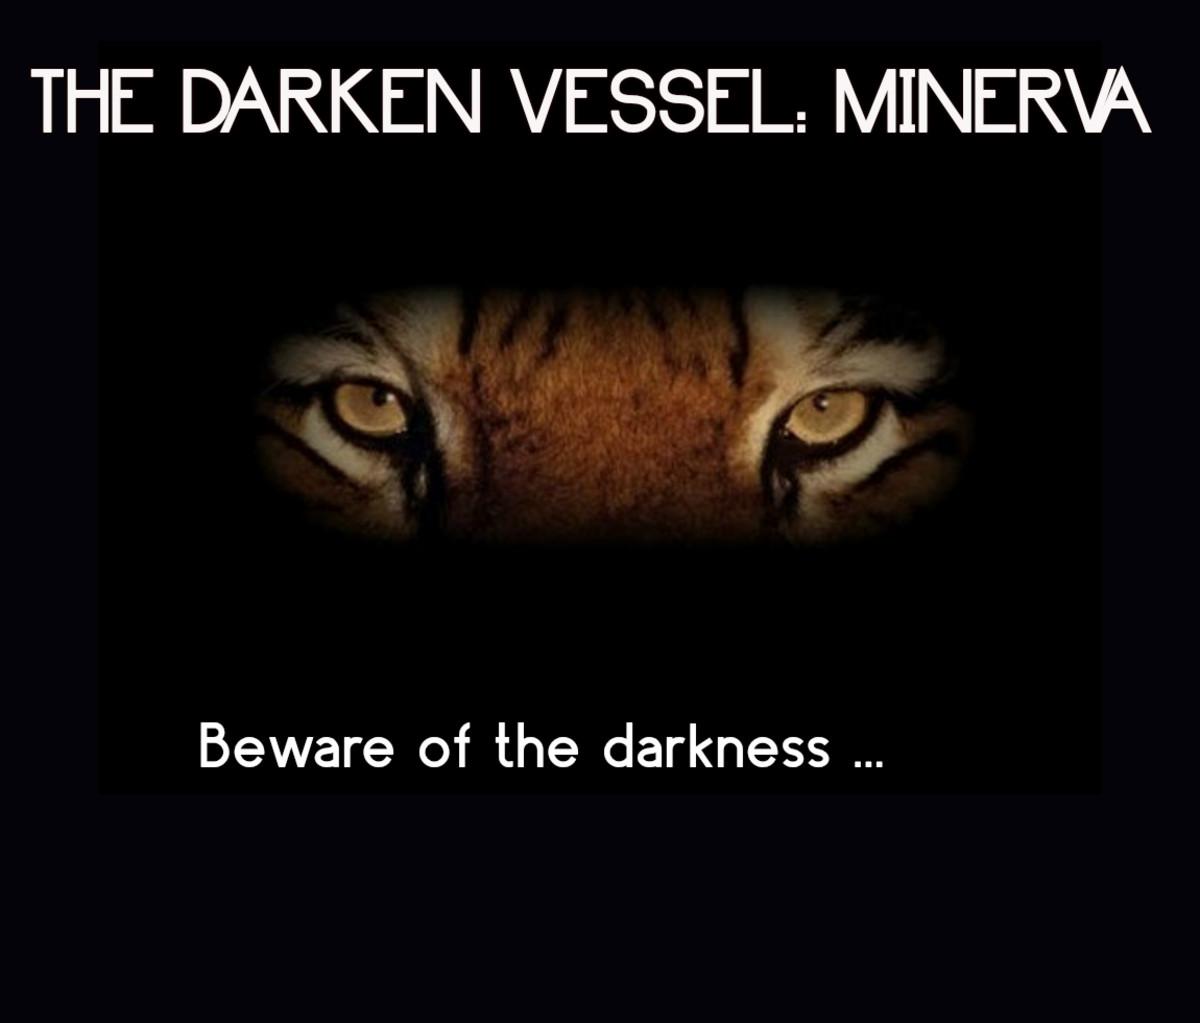 The Darken Vessel: Minerva 8